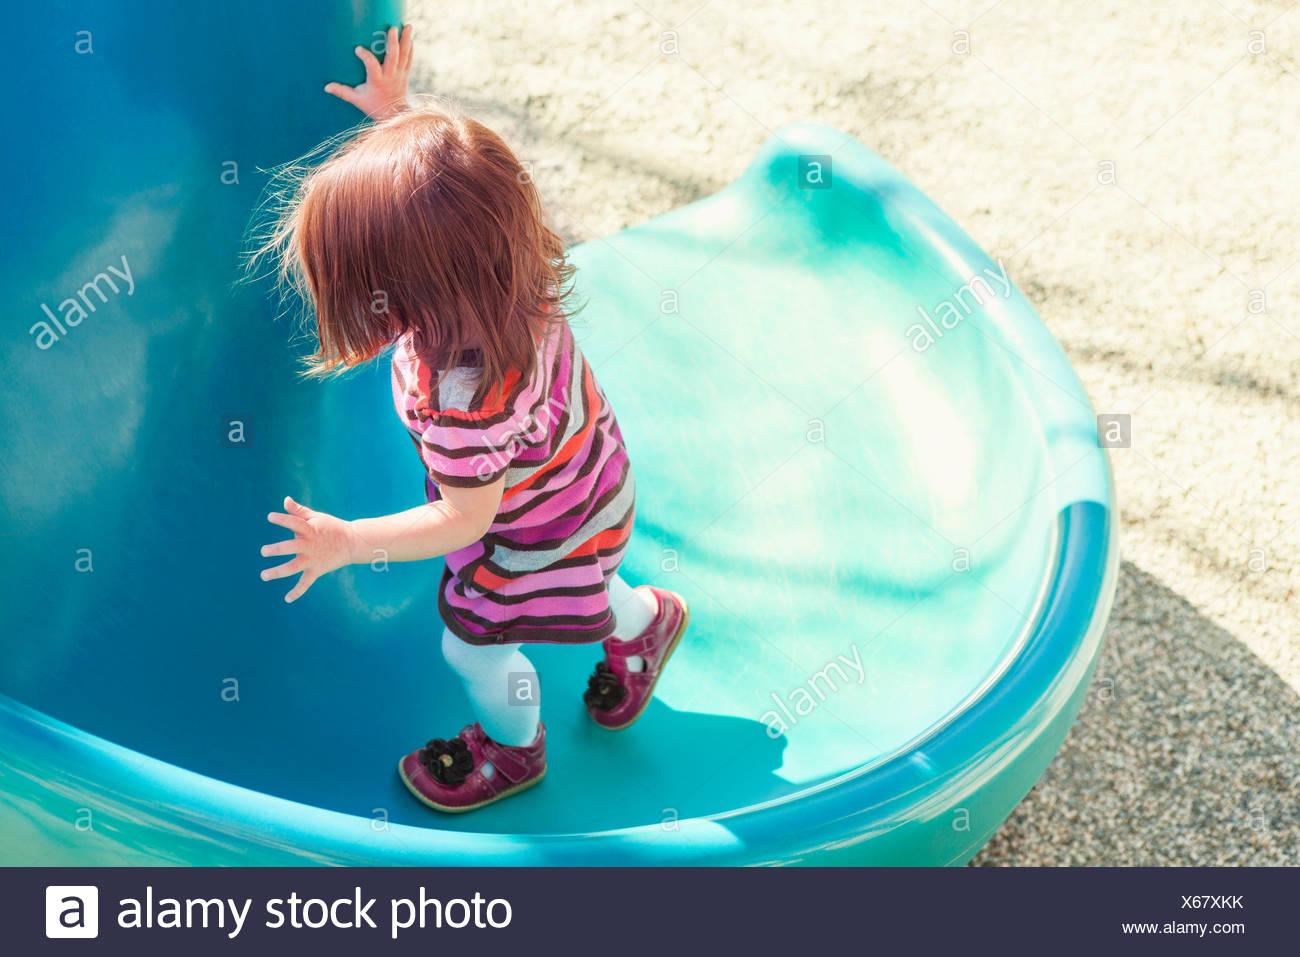 Baby girl climbing slide at playground - Stock Image